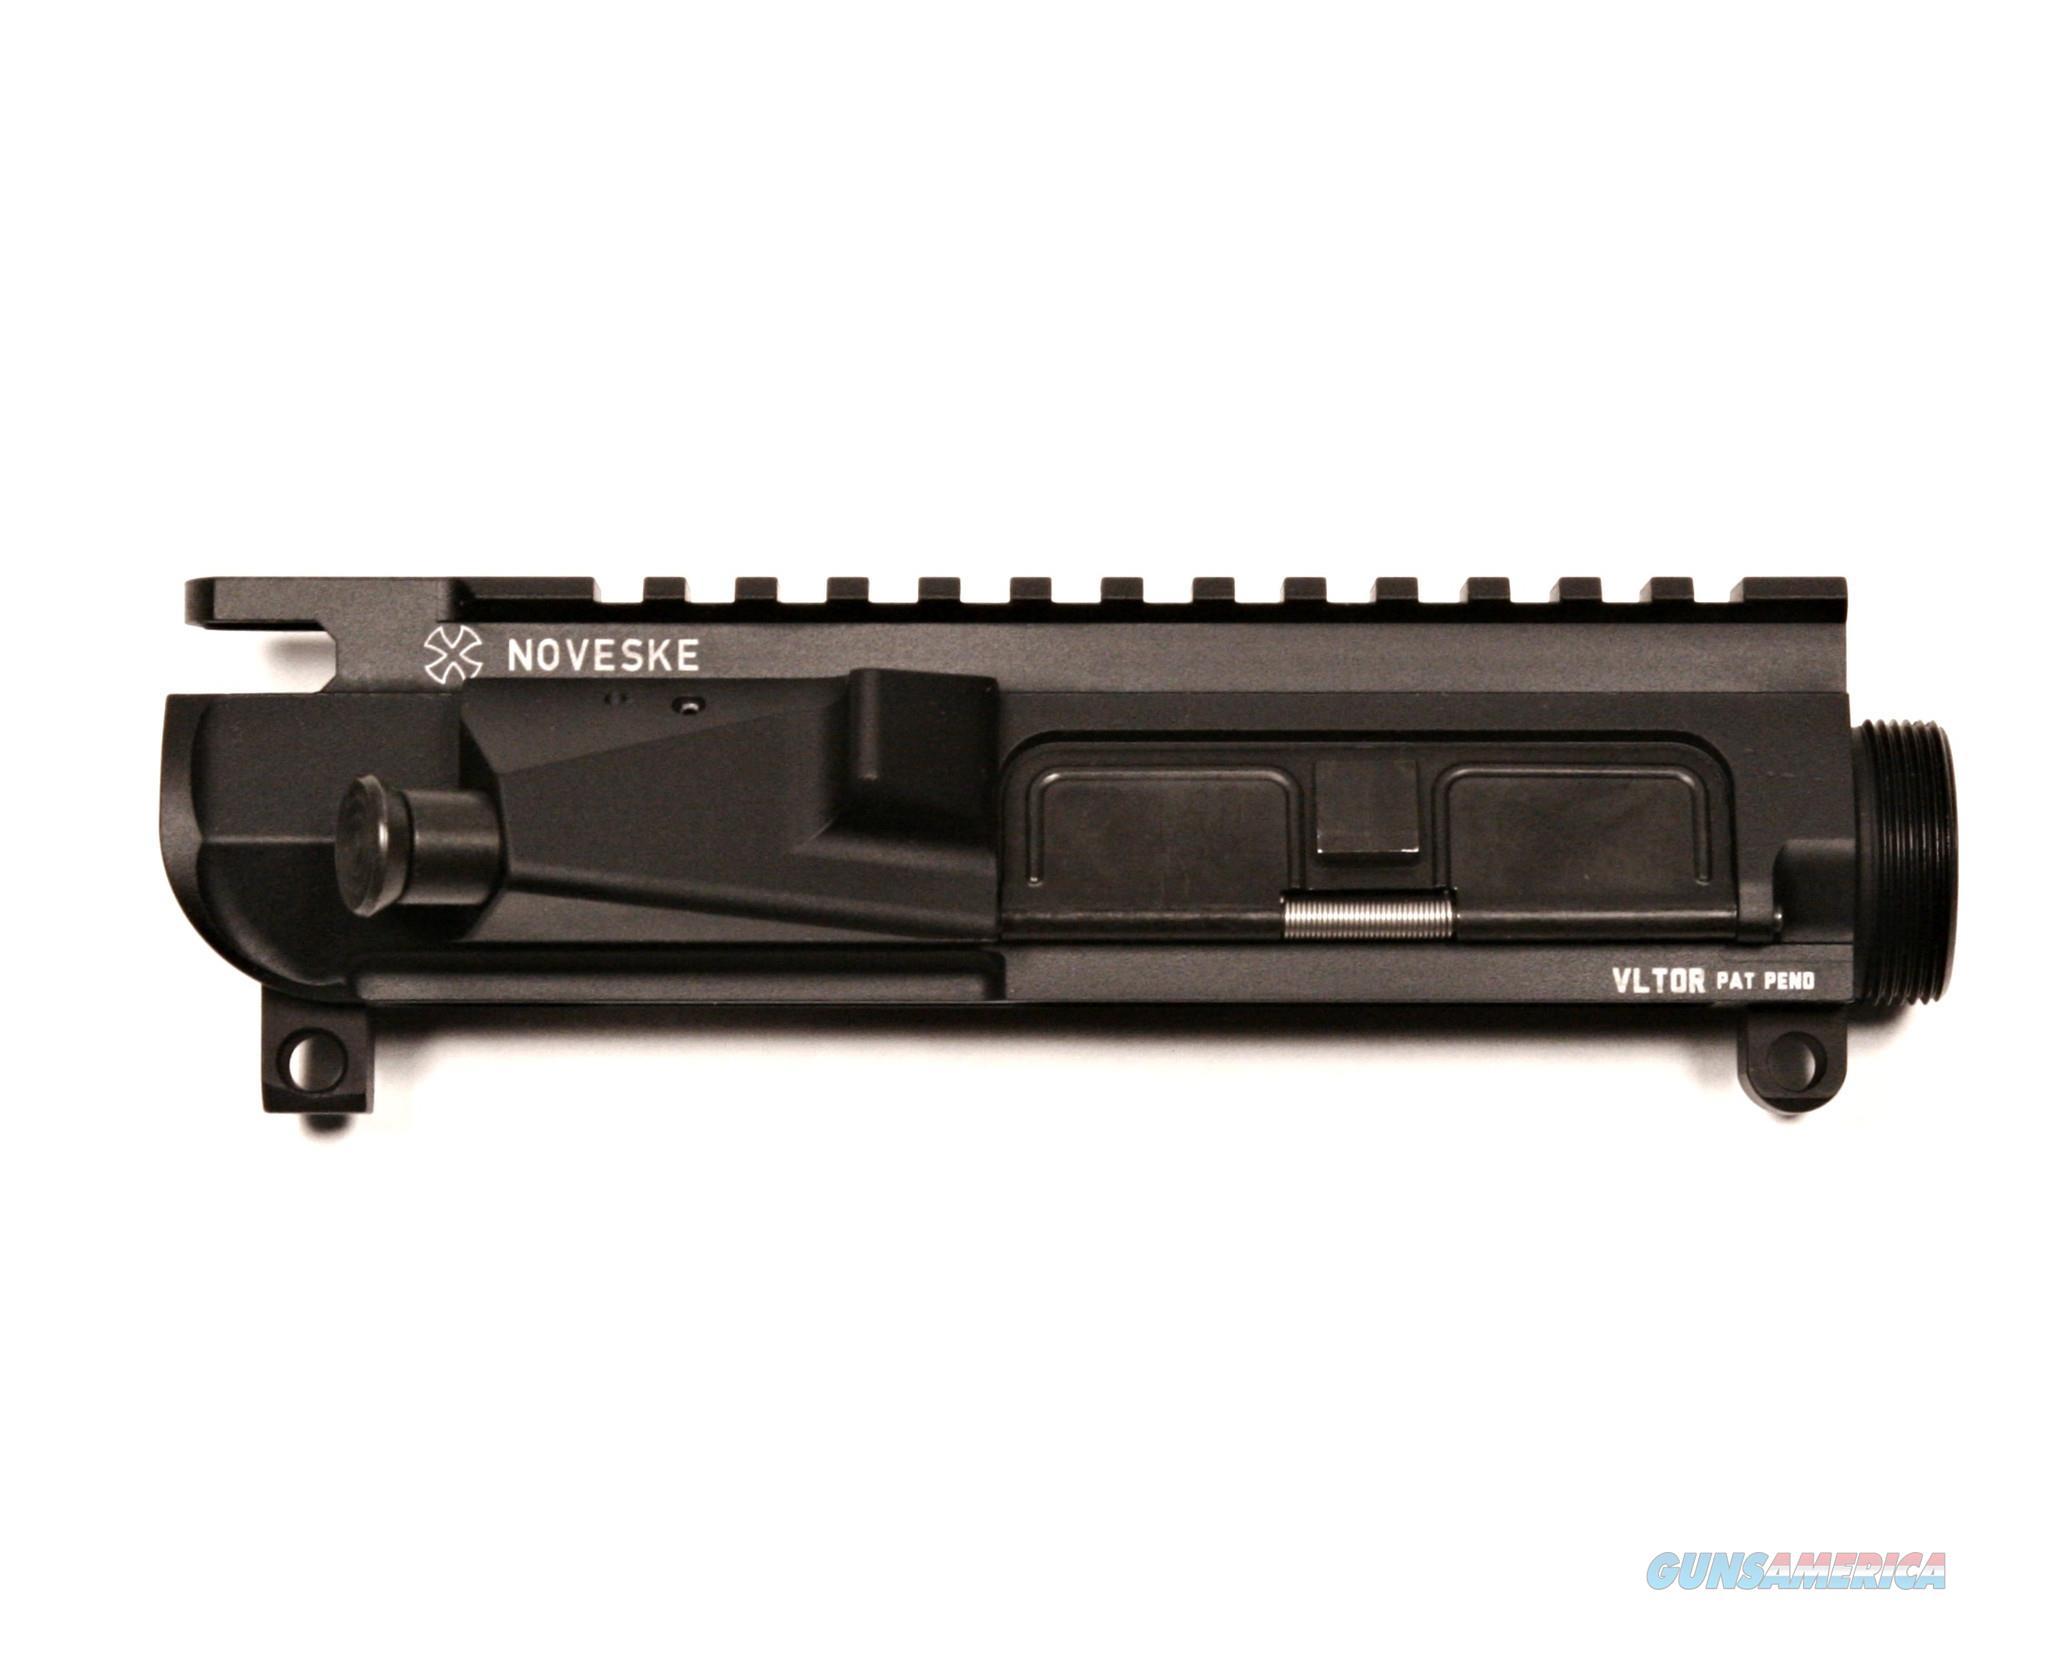 NOVESKE / VLTOR MUR AR-15 M4 5.56 UPPER RECEIVER 03000082  Non-Guns > Gun Parts > M16-AR15 > Upper Only